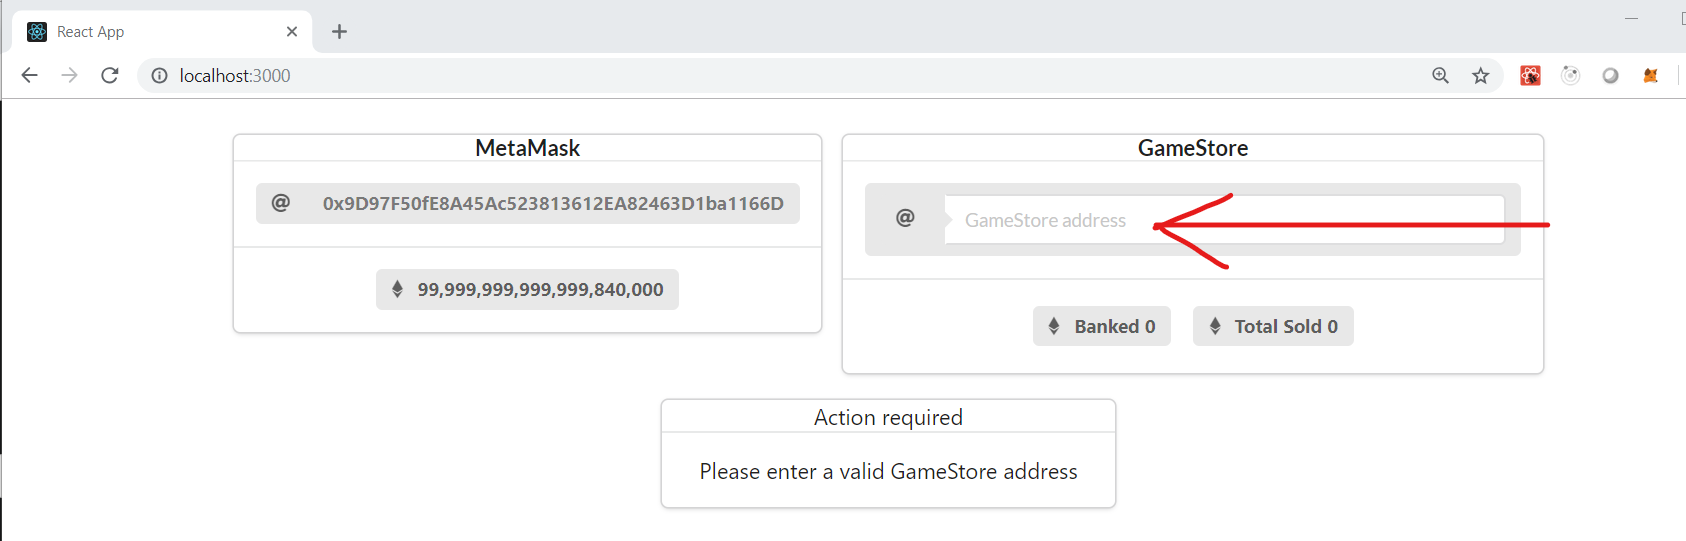 Configure GameStore